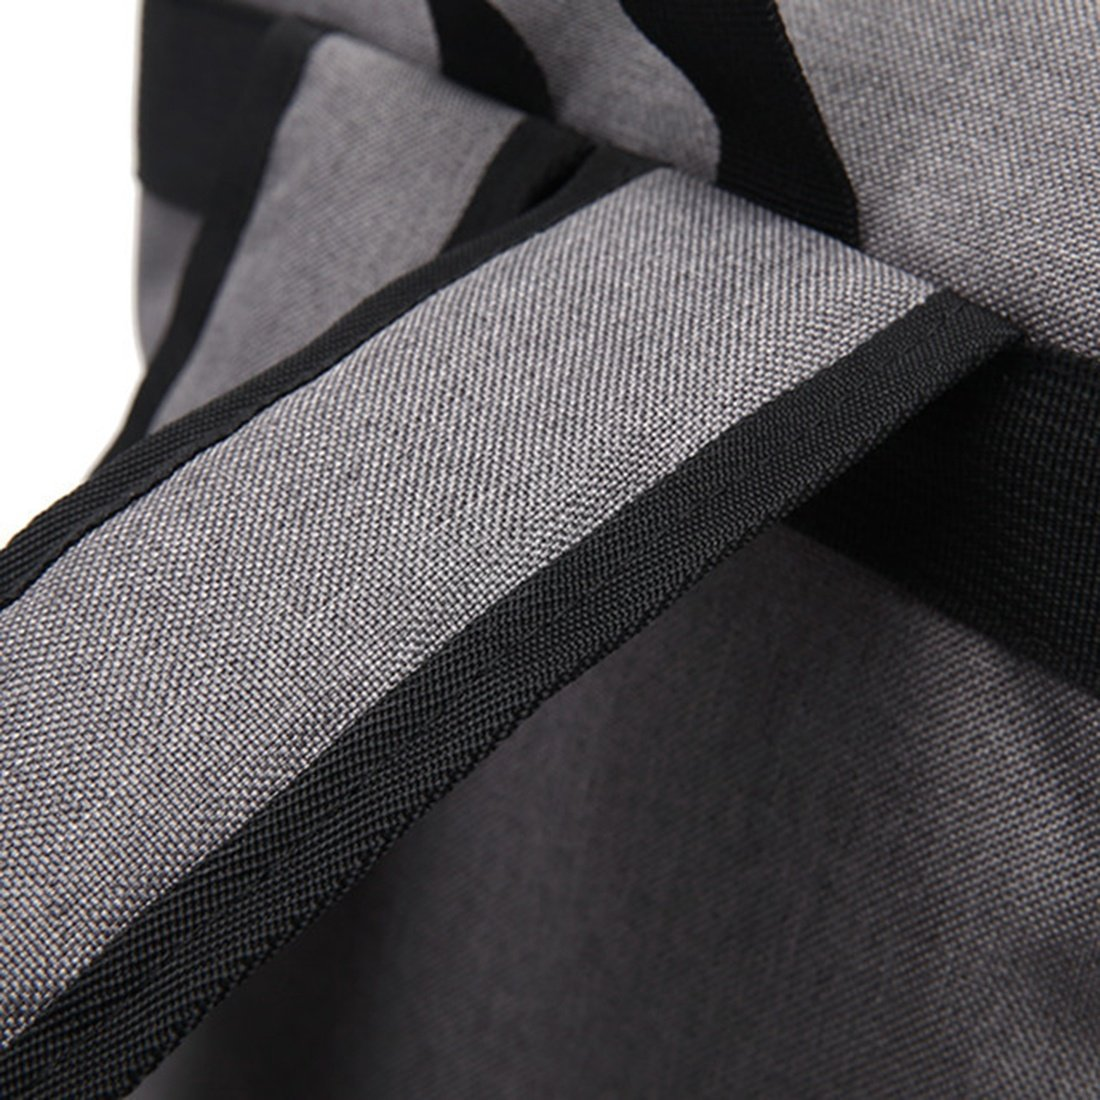 Mochila para Portátil Material de Bolsas Tela Oxford Impermeable Transpirable Durable Unisex Viaje, Escuela, Bolsas de de Ocio al Aire Libre, 1, Small 61356f